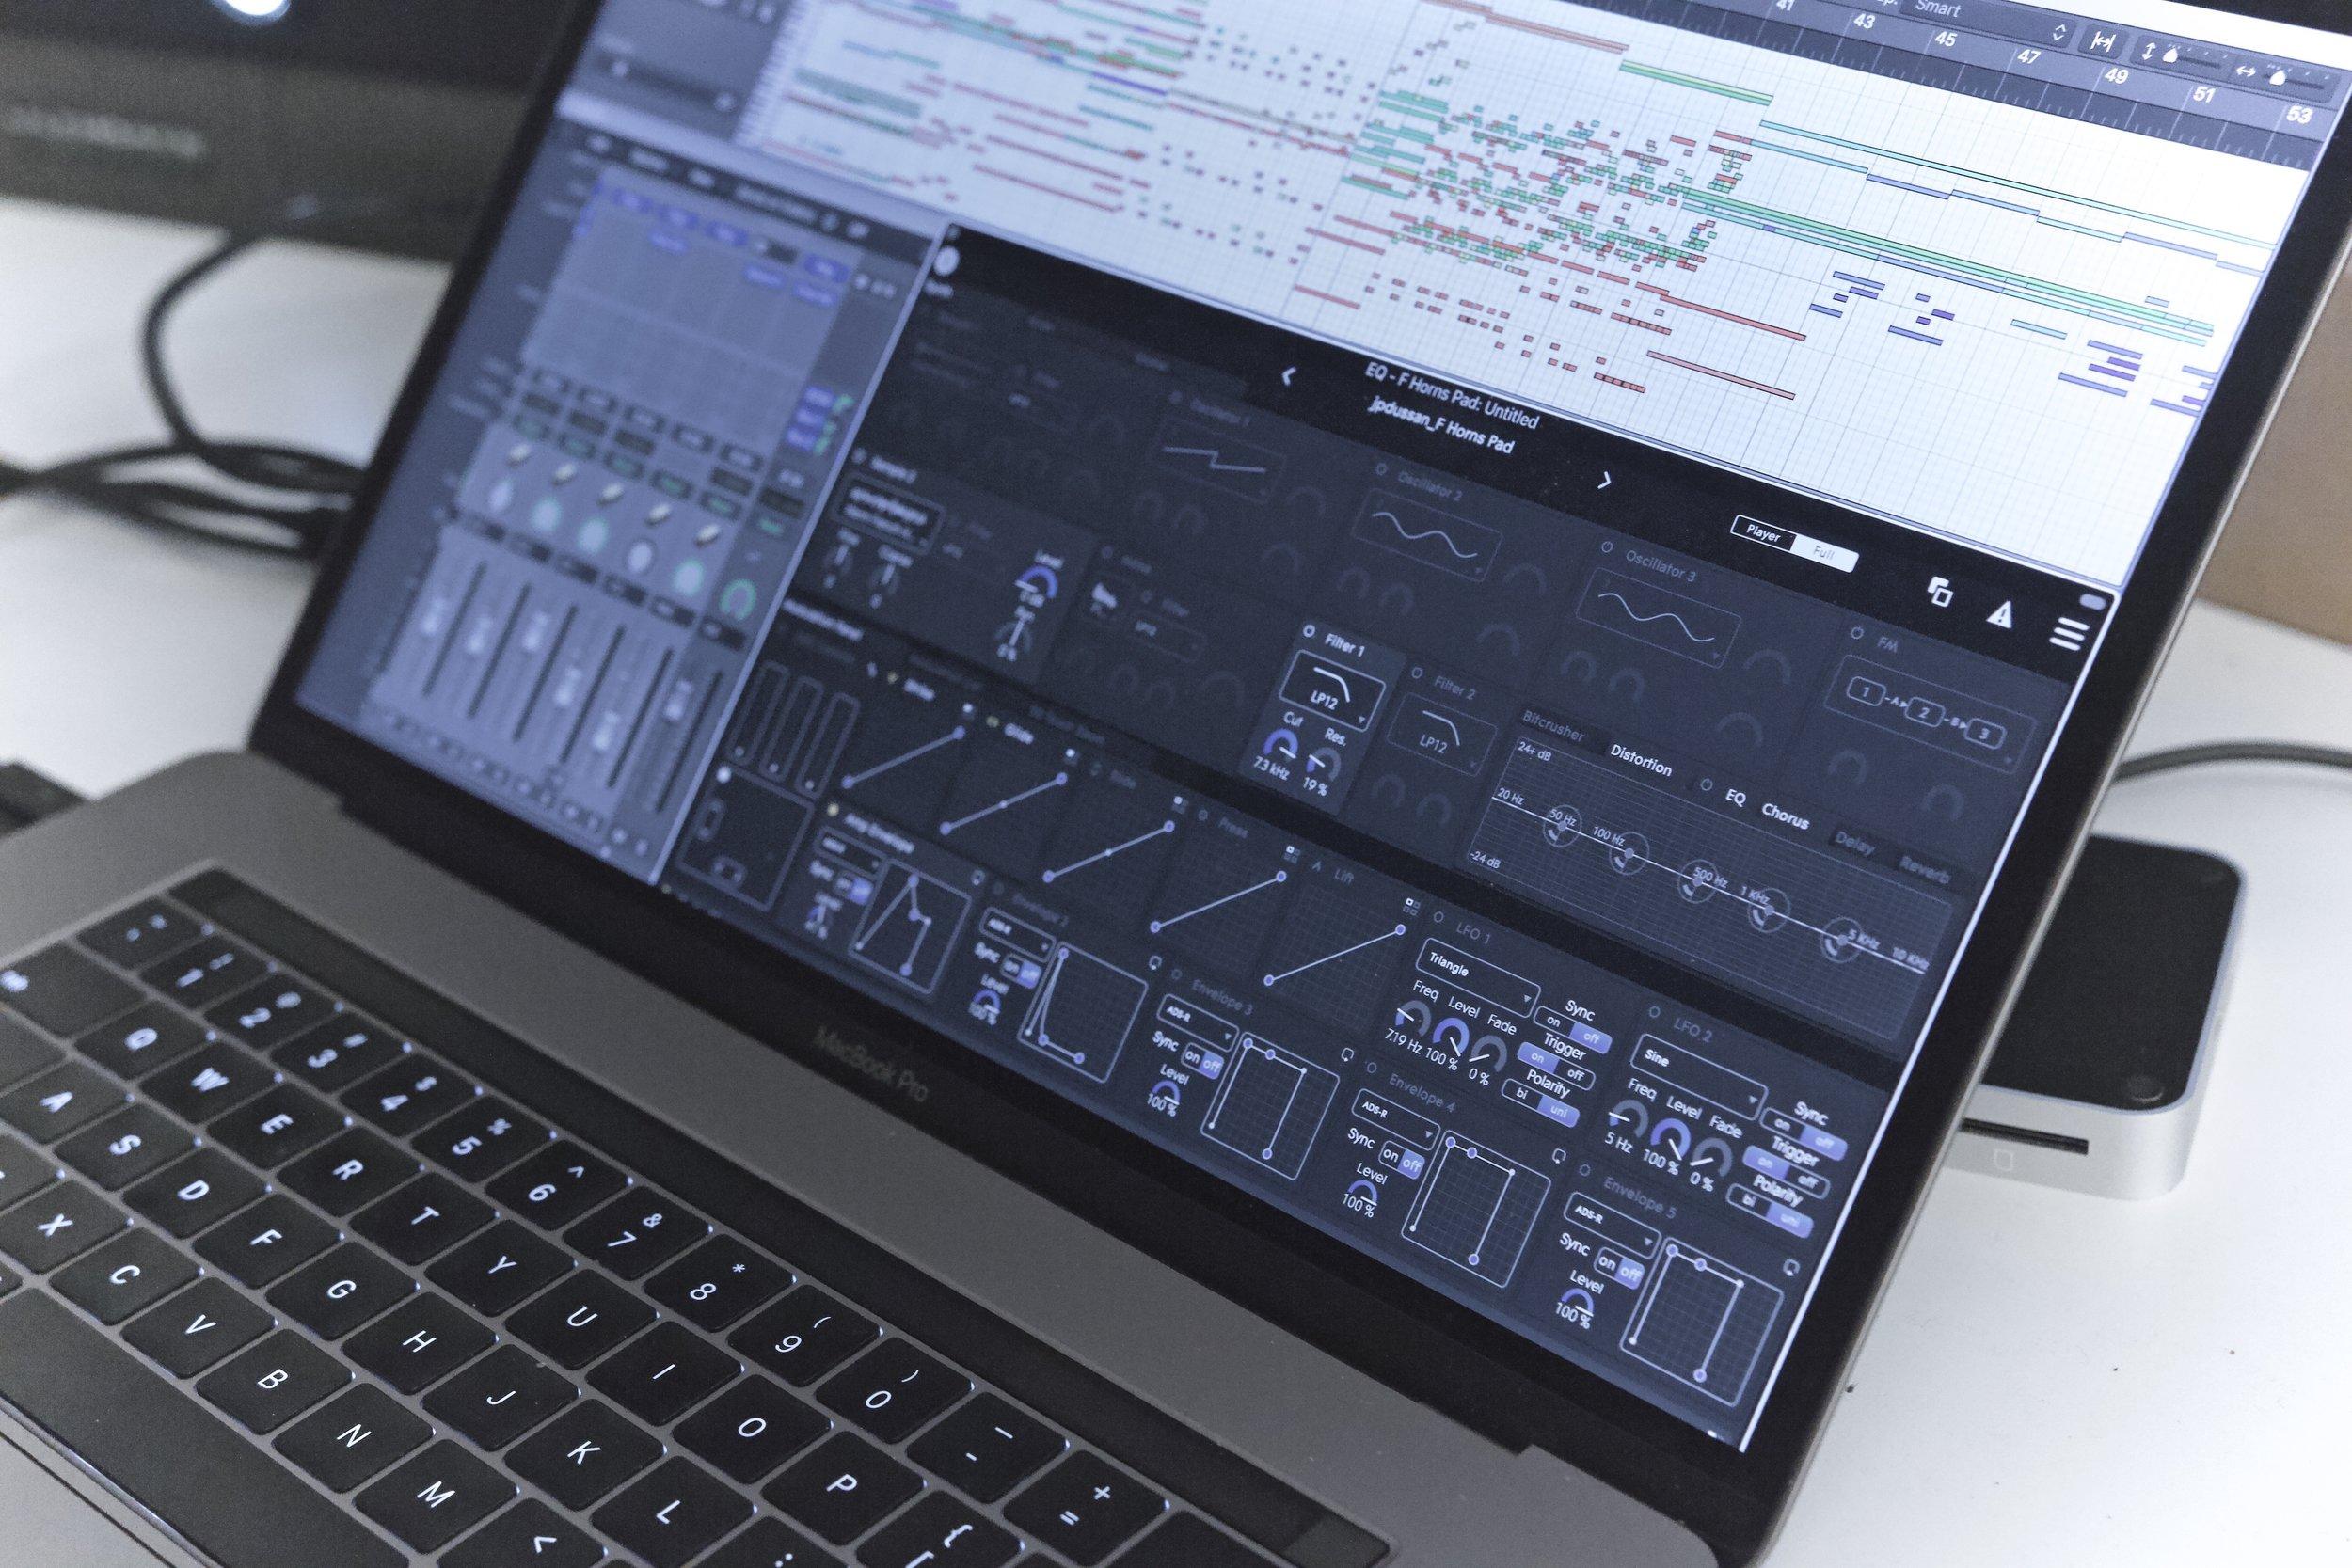 MacBook Pro running  Logic Pro X  with  ROLI Equator  instrument plugin.